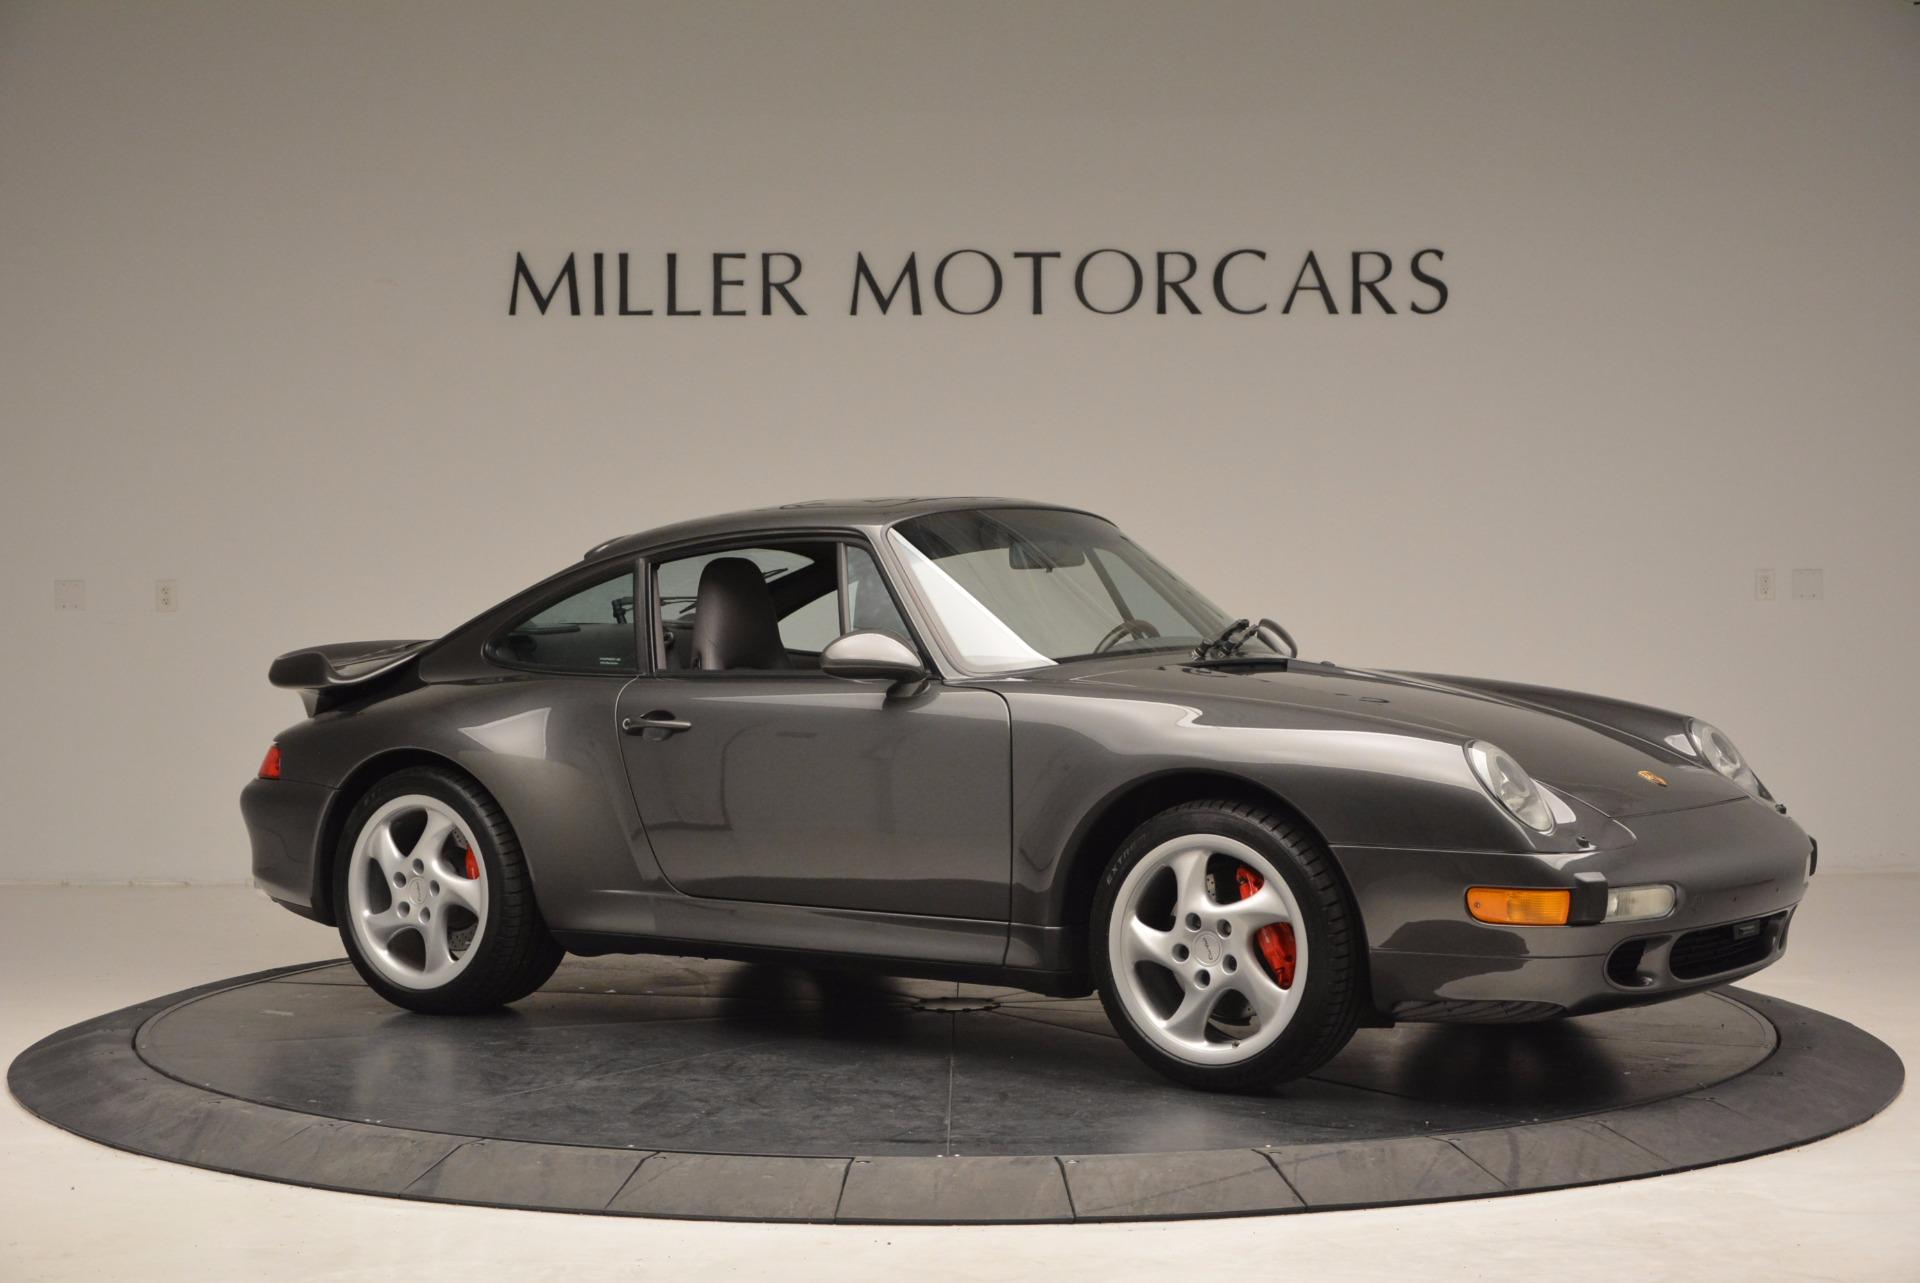 Used 1996 Porsche 911 Turbo For Sale In Greenwich, CT 1058_p10